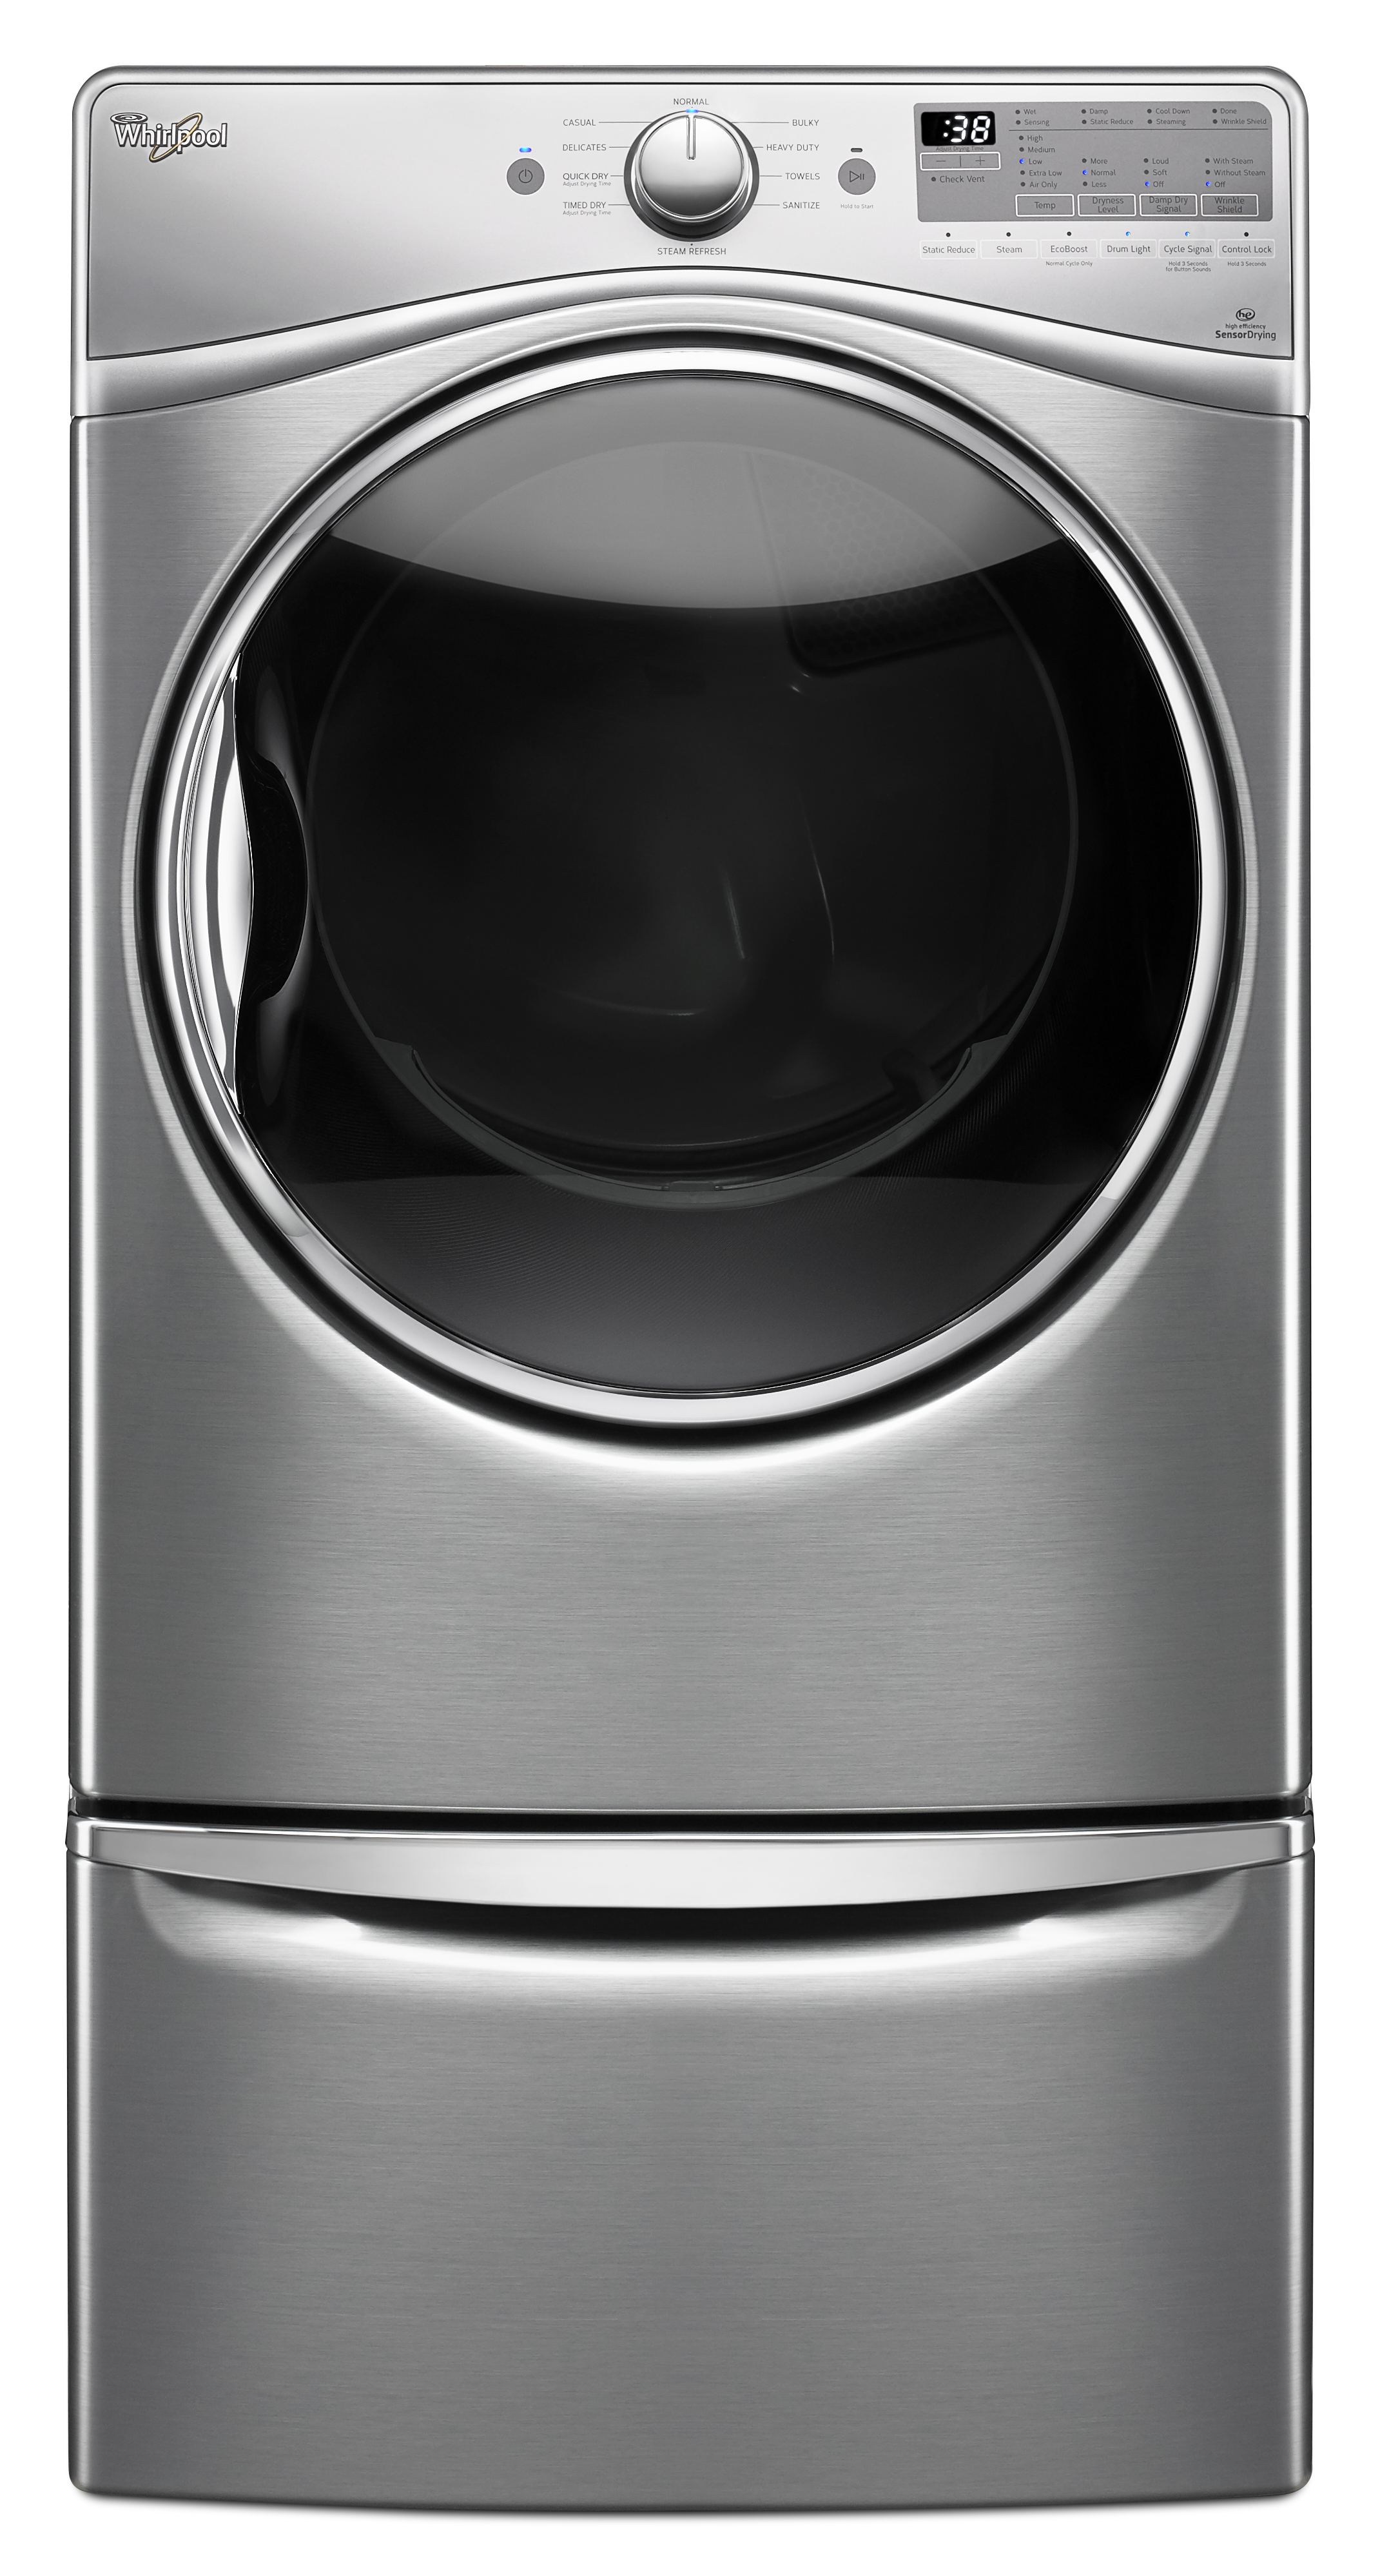 Whirlpool WED92HEFU 7.4 cu. ft. Electric Dryer w/ Advanced Moisture Sensing - Diamond Steel